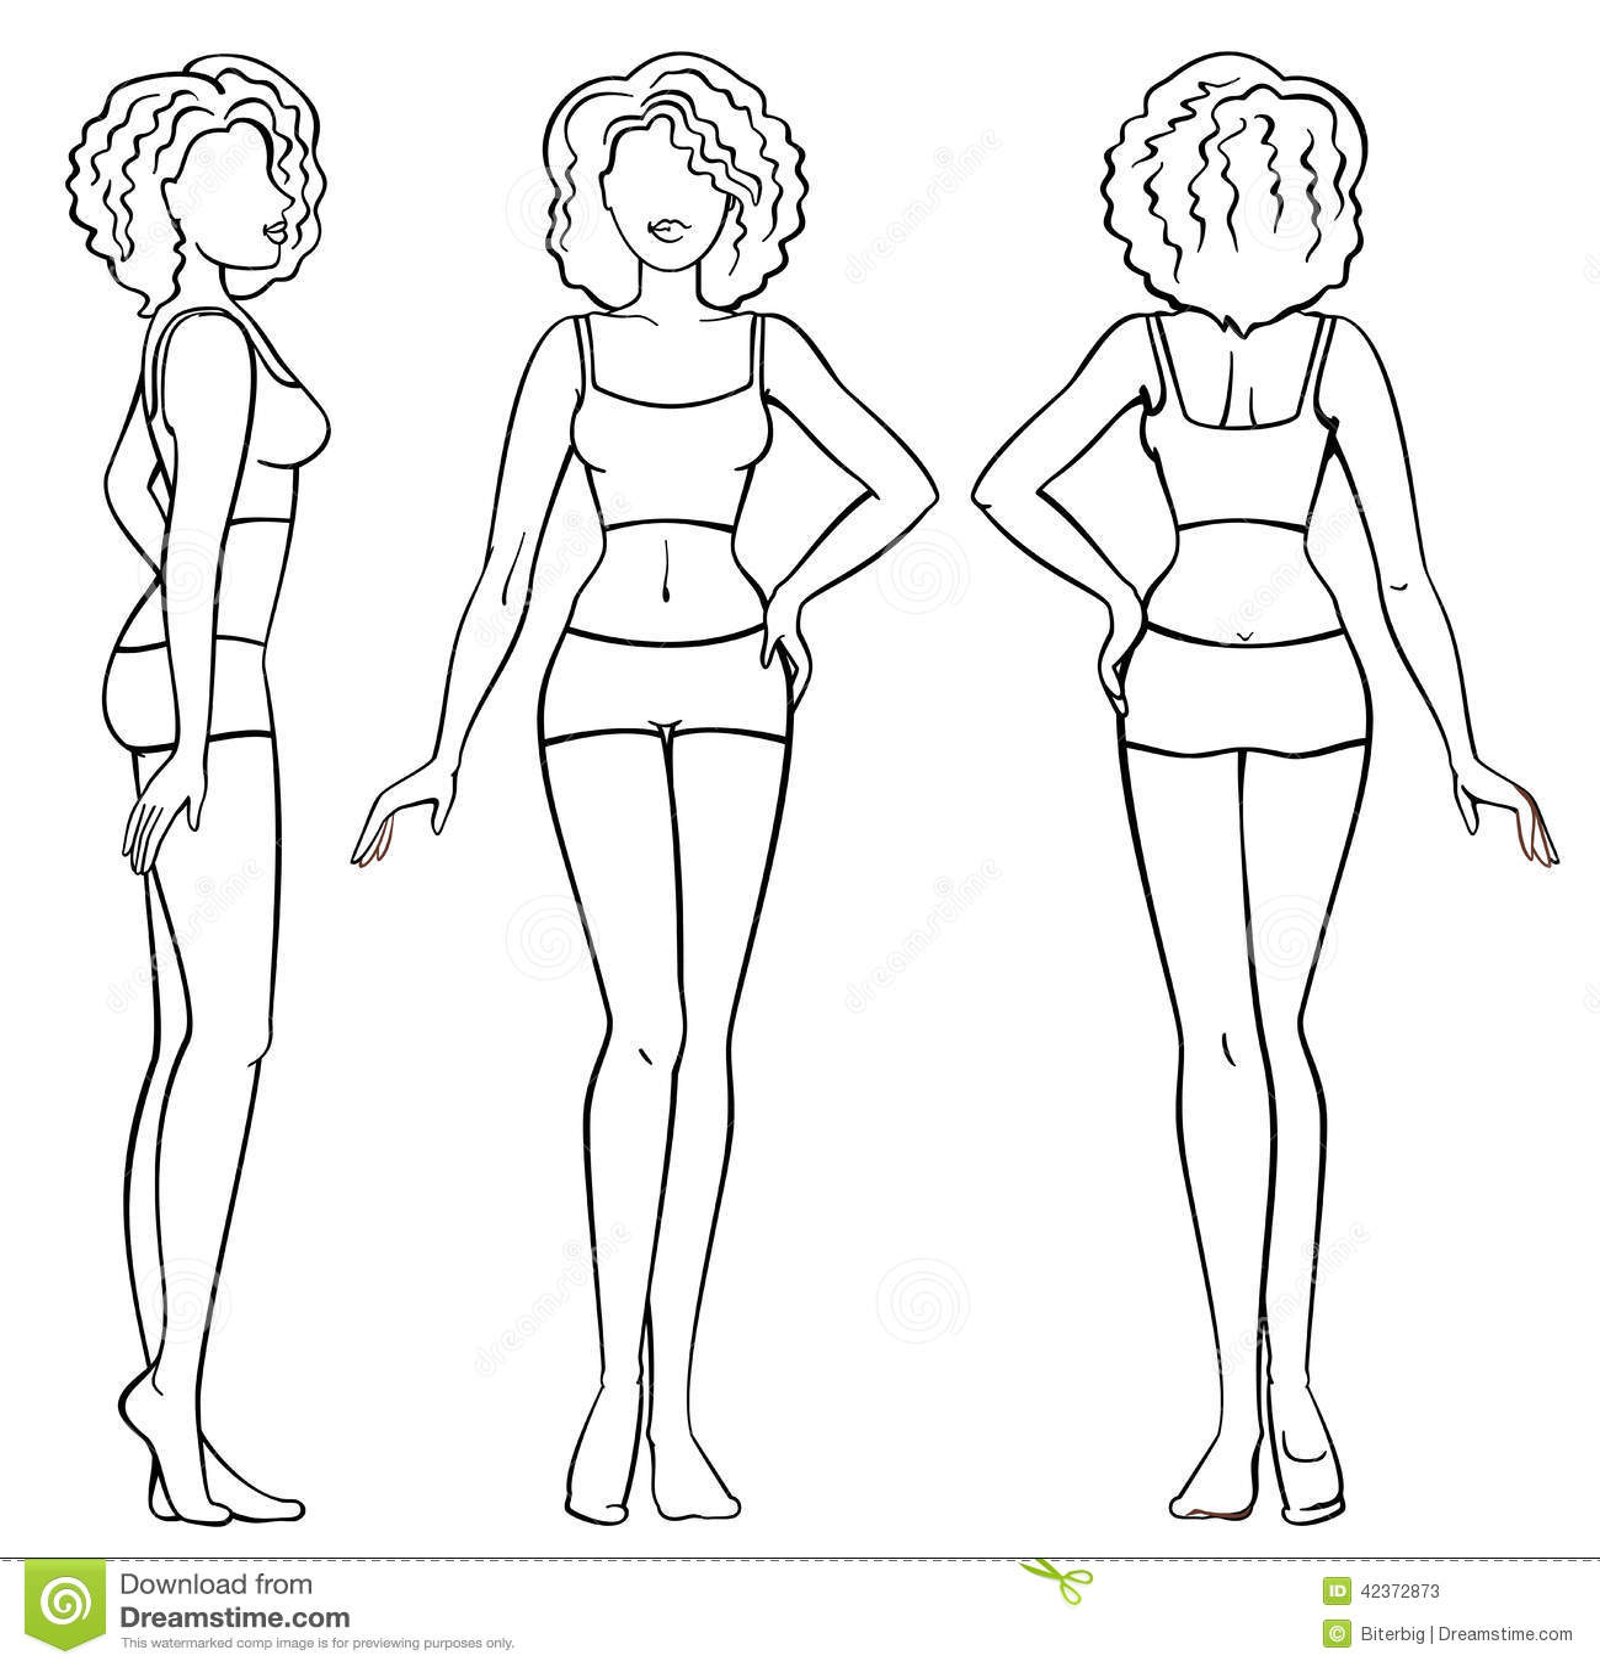 Aankleedpop Kind Kleurplaat Woman Body Stock Vector Illustration Of Side Biology